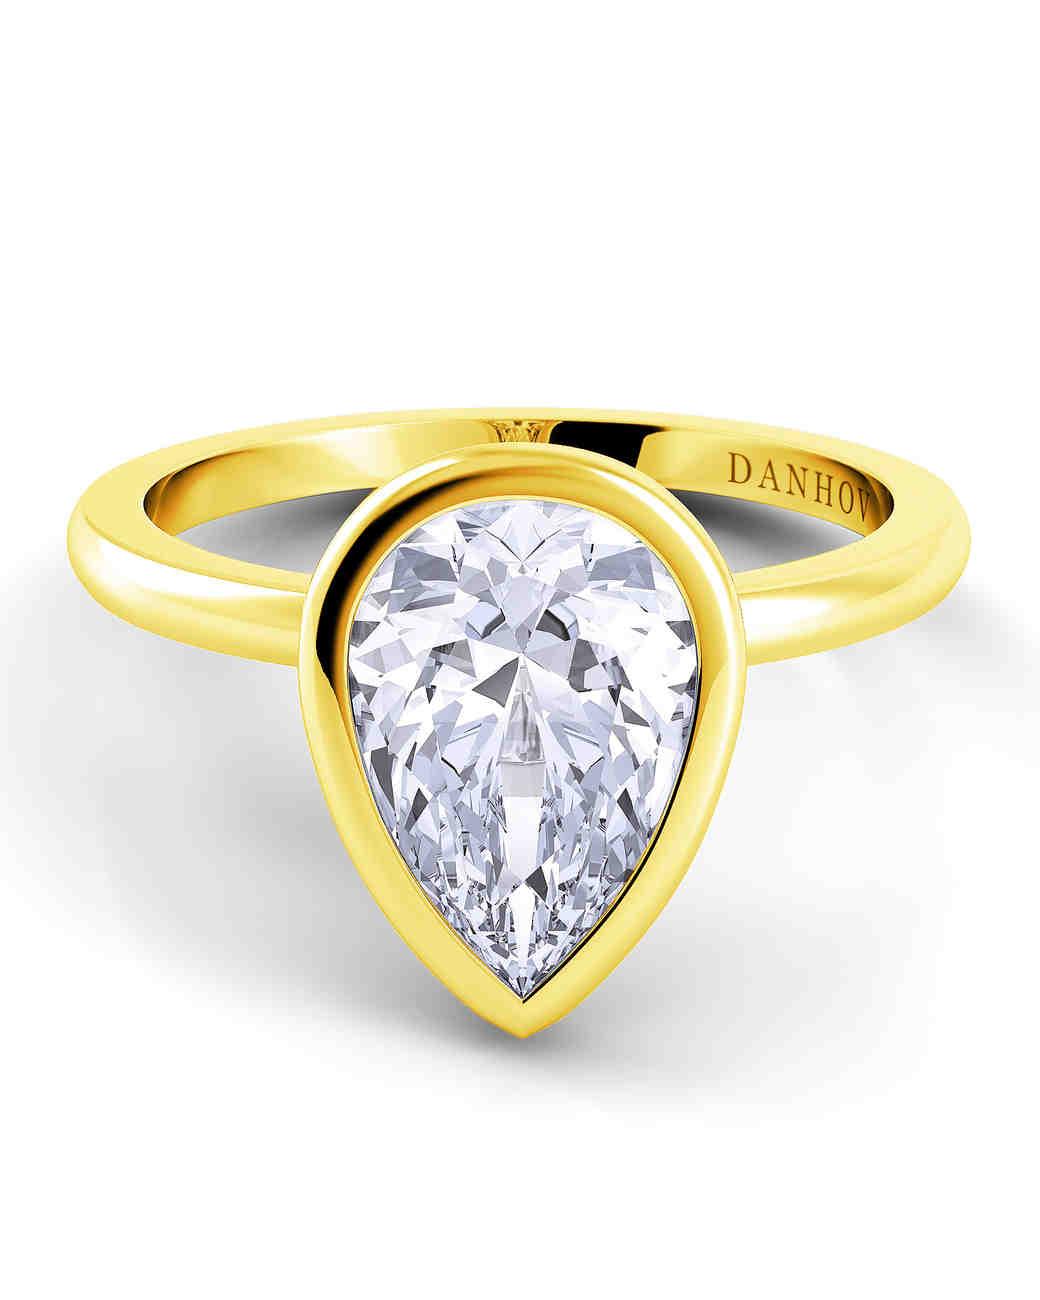 Danhov bezel set yellow gold engagement ring pear-cut diamond